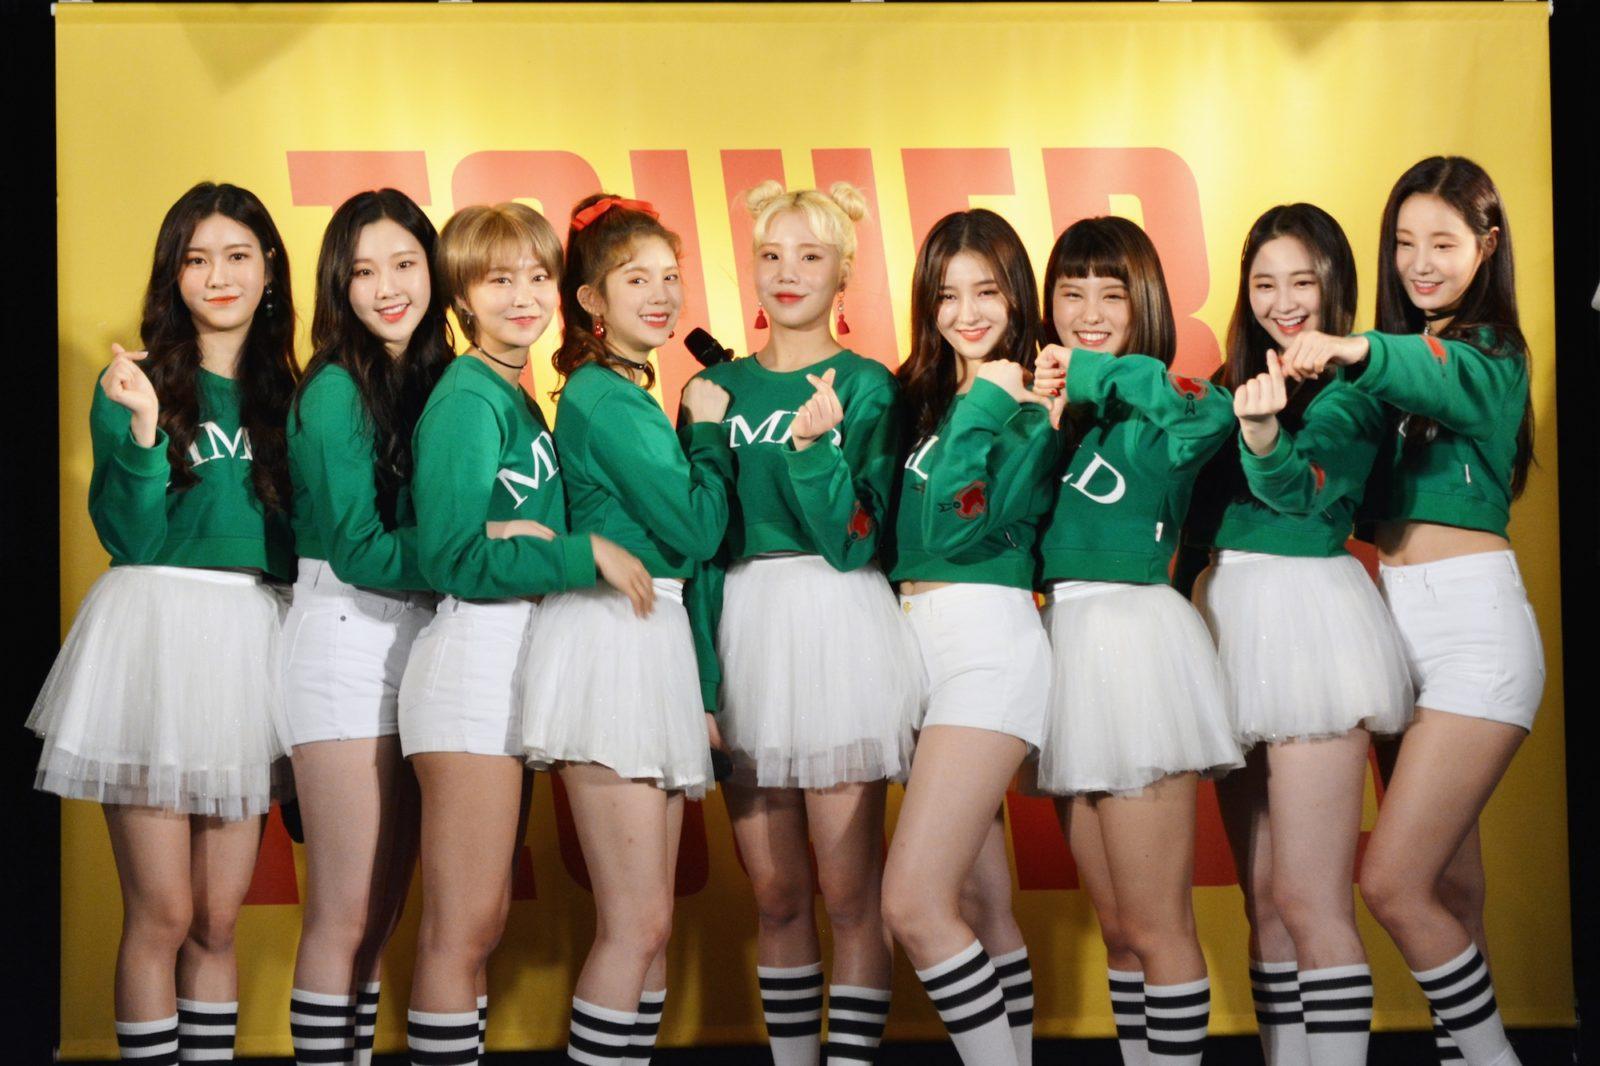 MOMOLANDが日本デビューを発表!韓国で大旋風の人気急上昇中のガールズグループが初の日本ショーケースライブを開催サムネイル画像